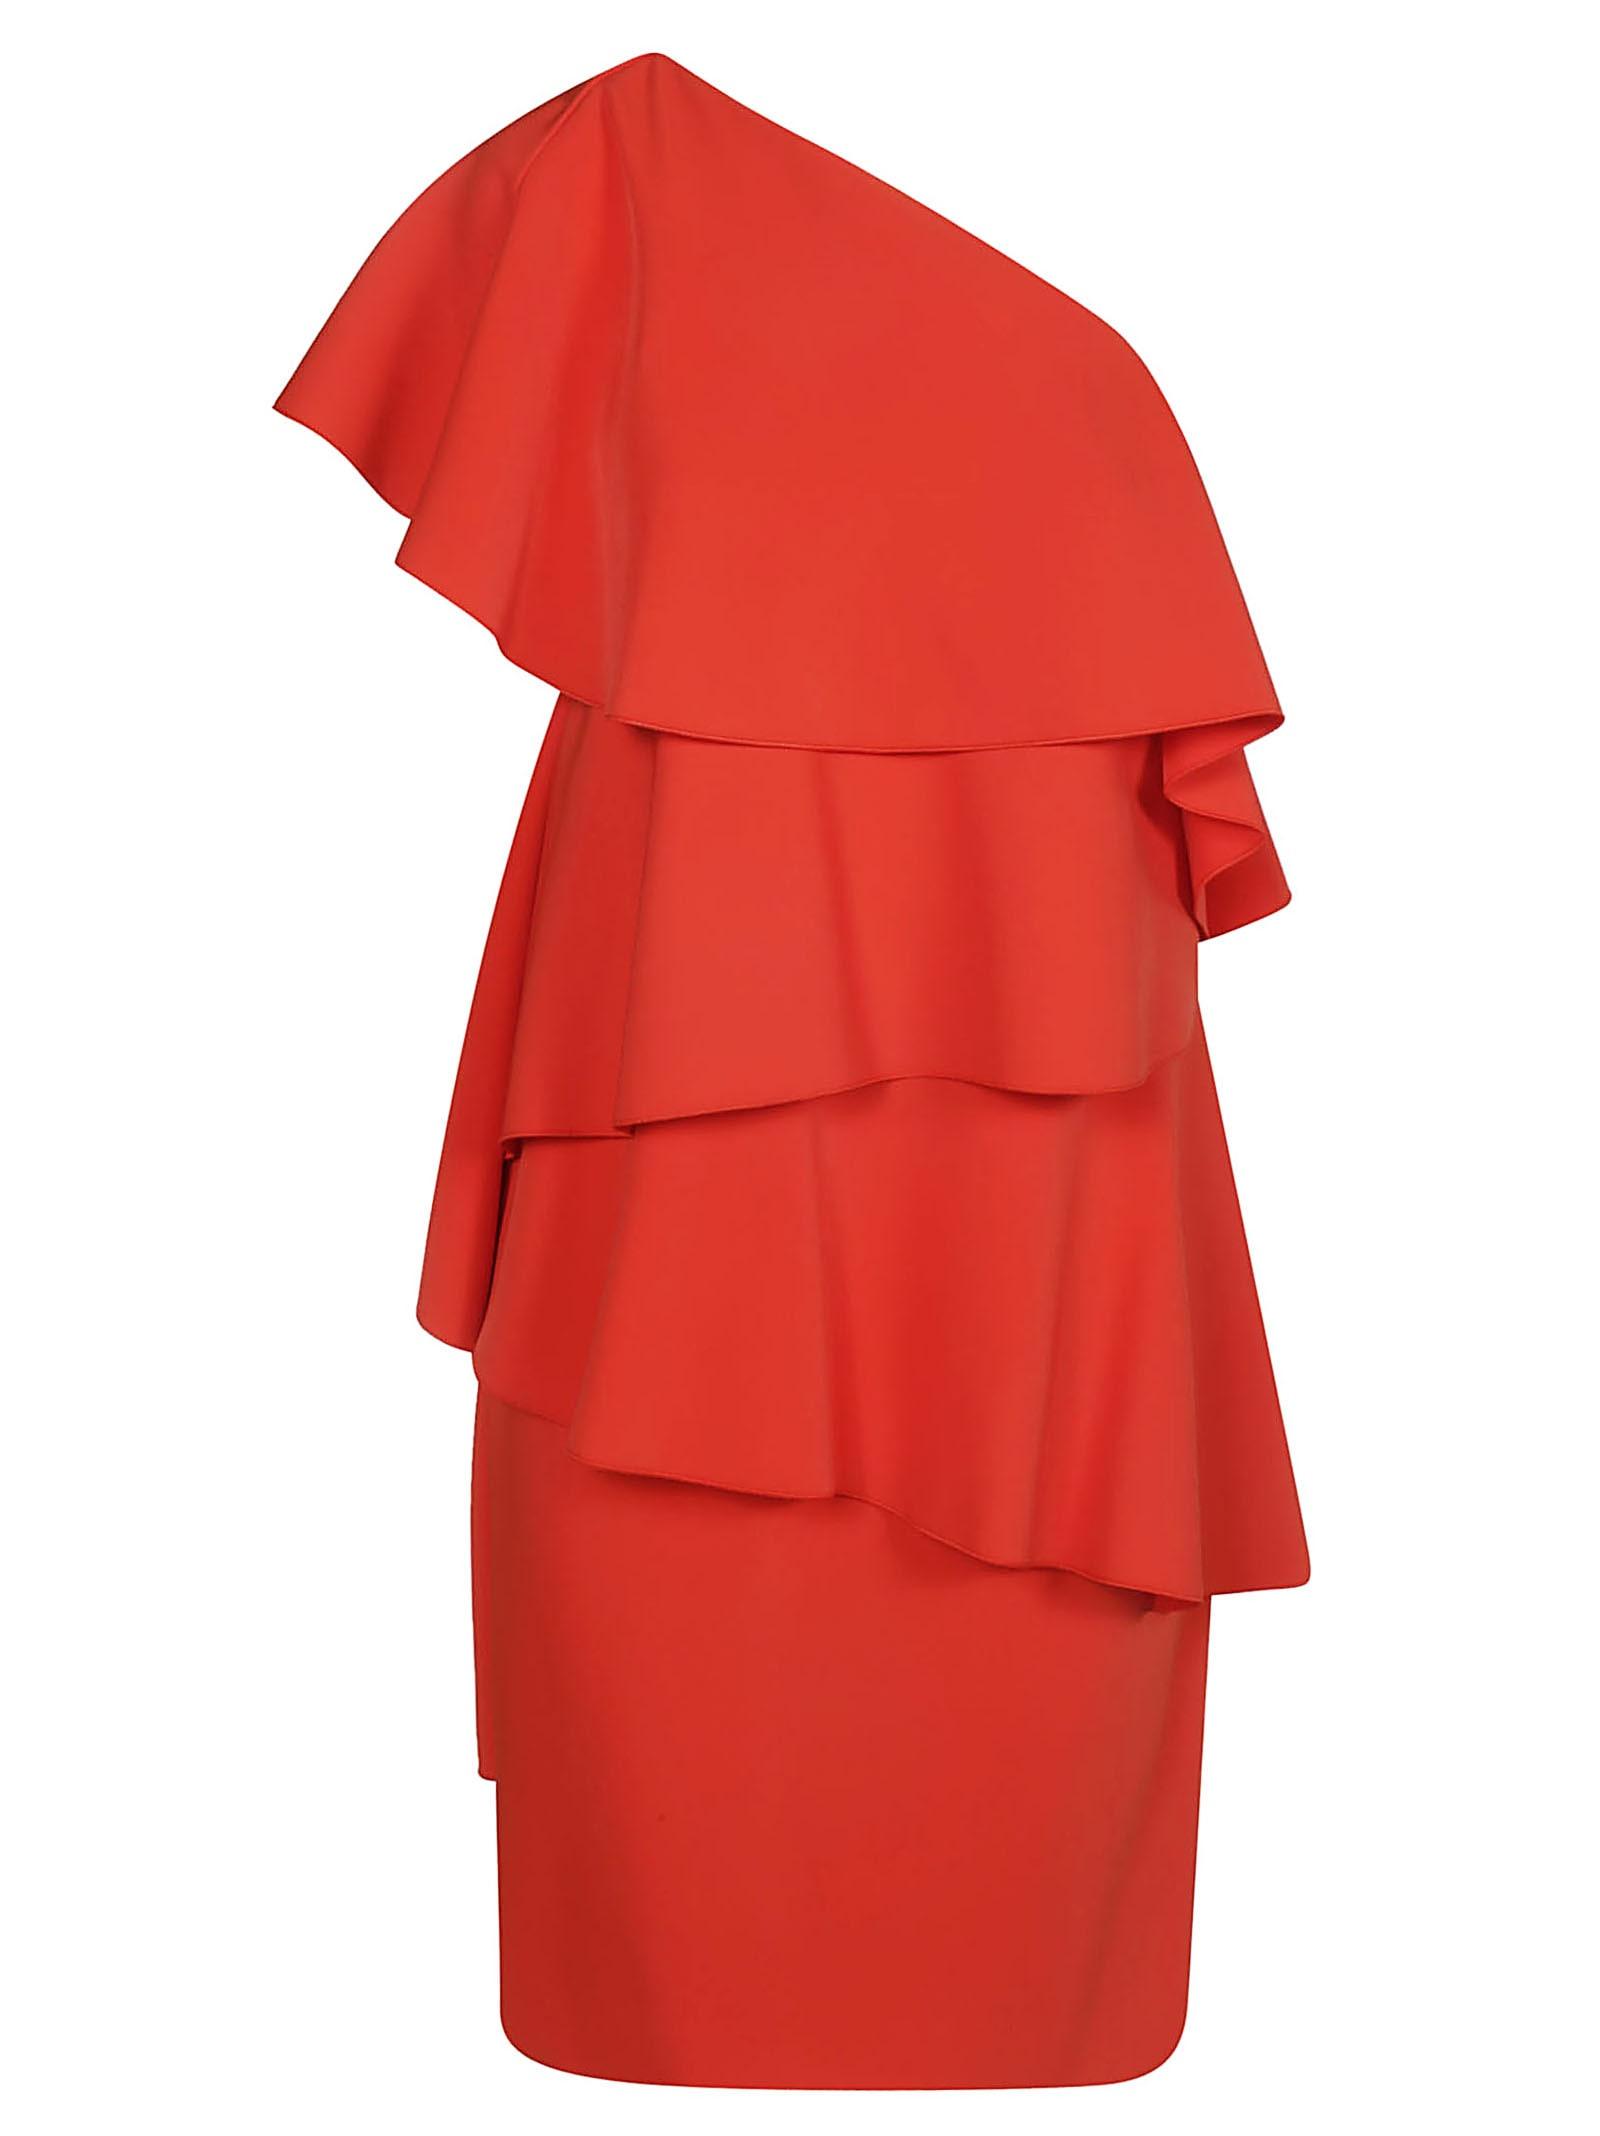 Lanvin Ruffled One Shoulder Dress